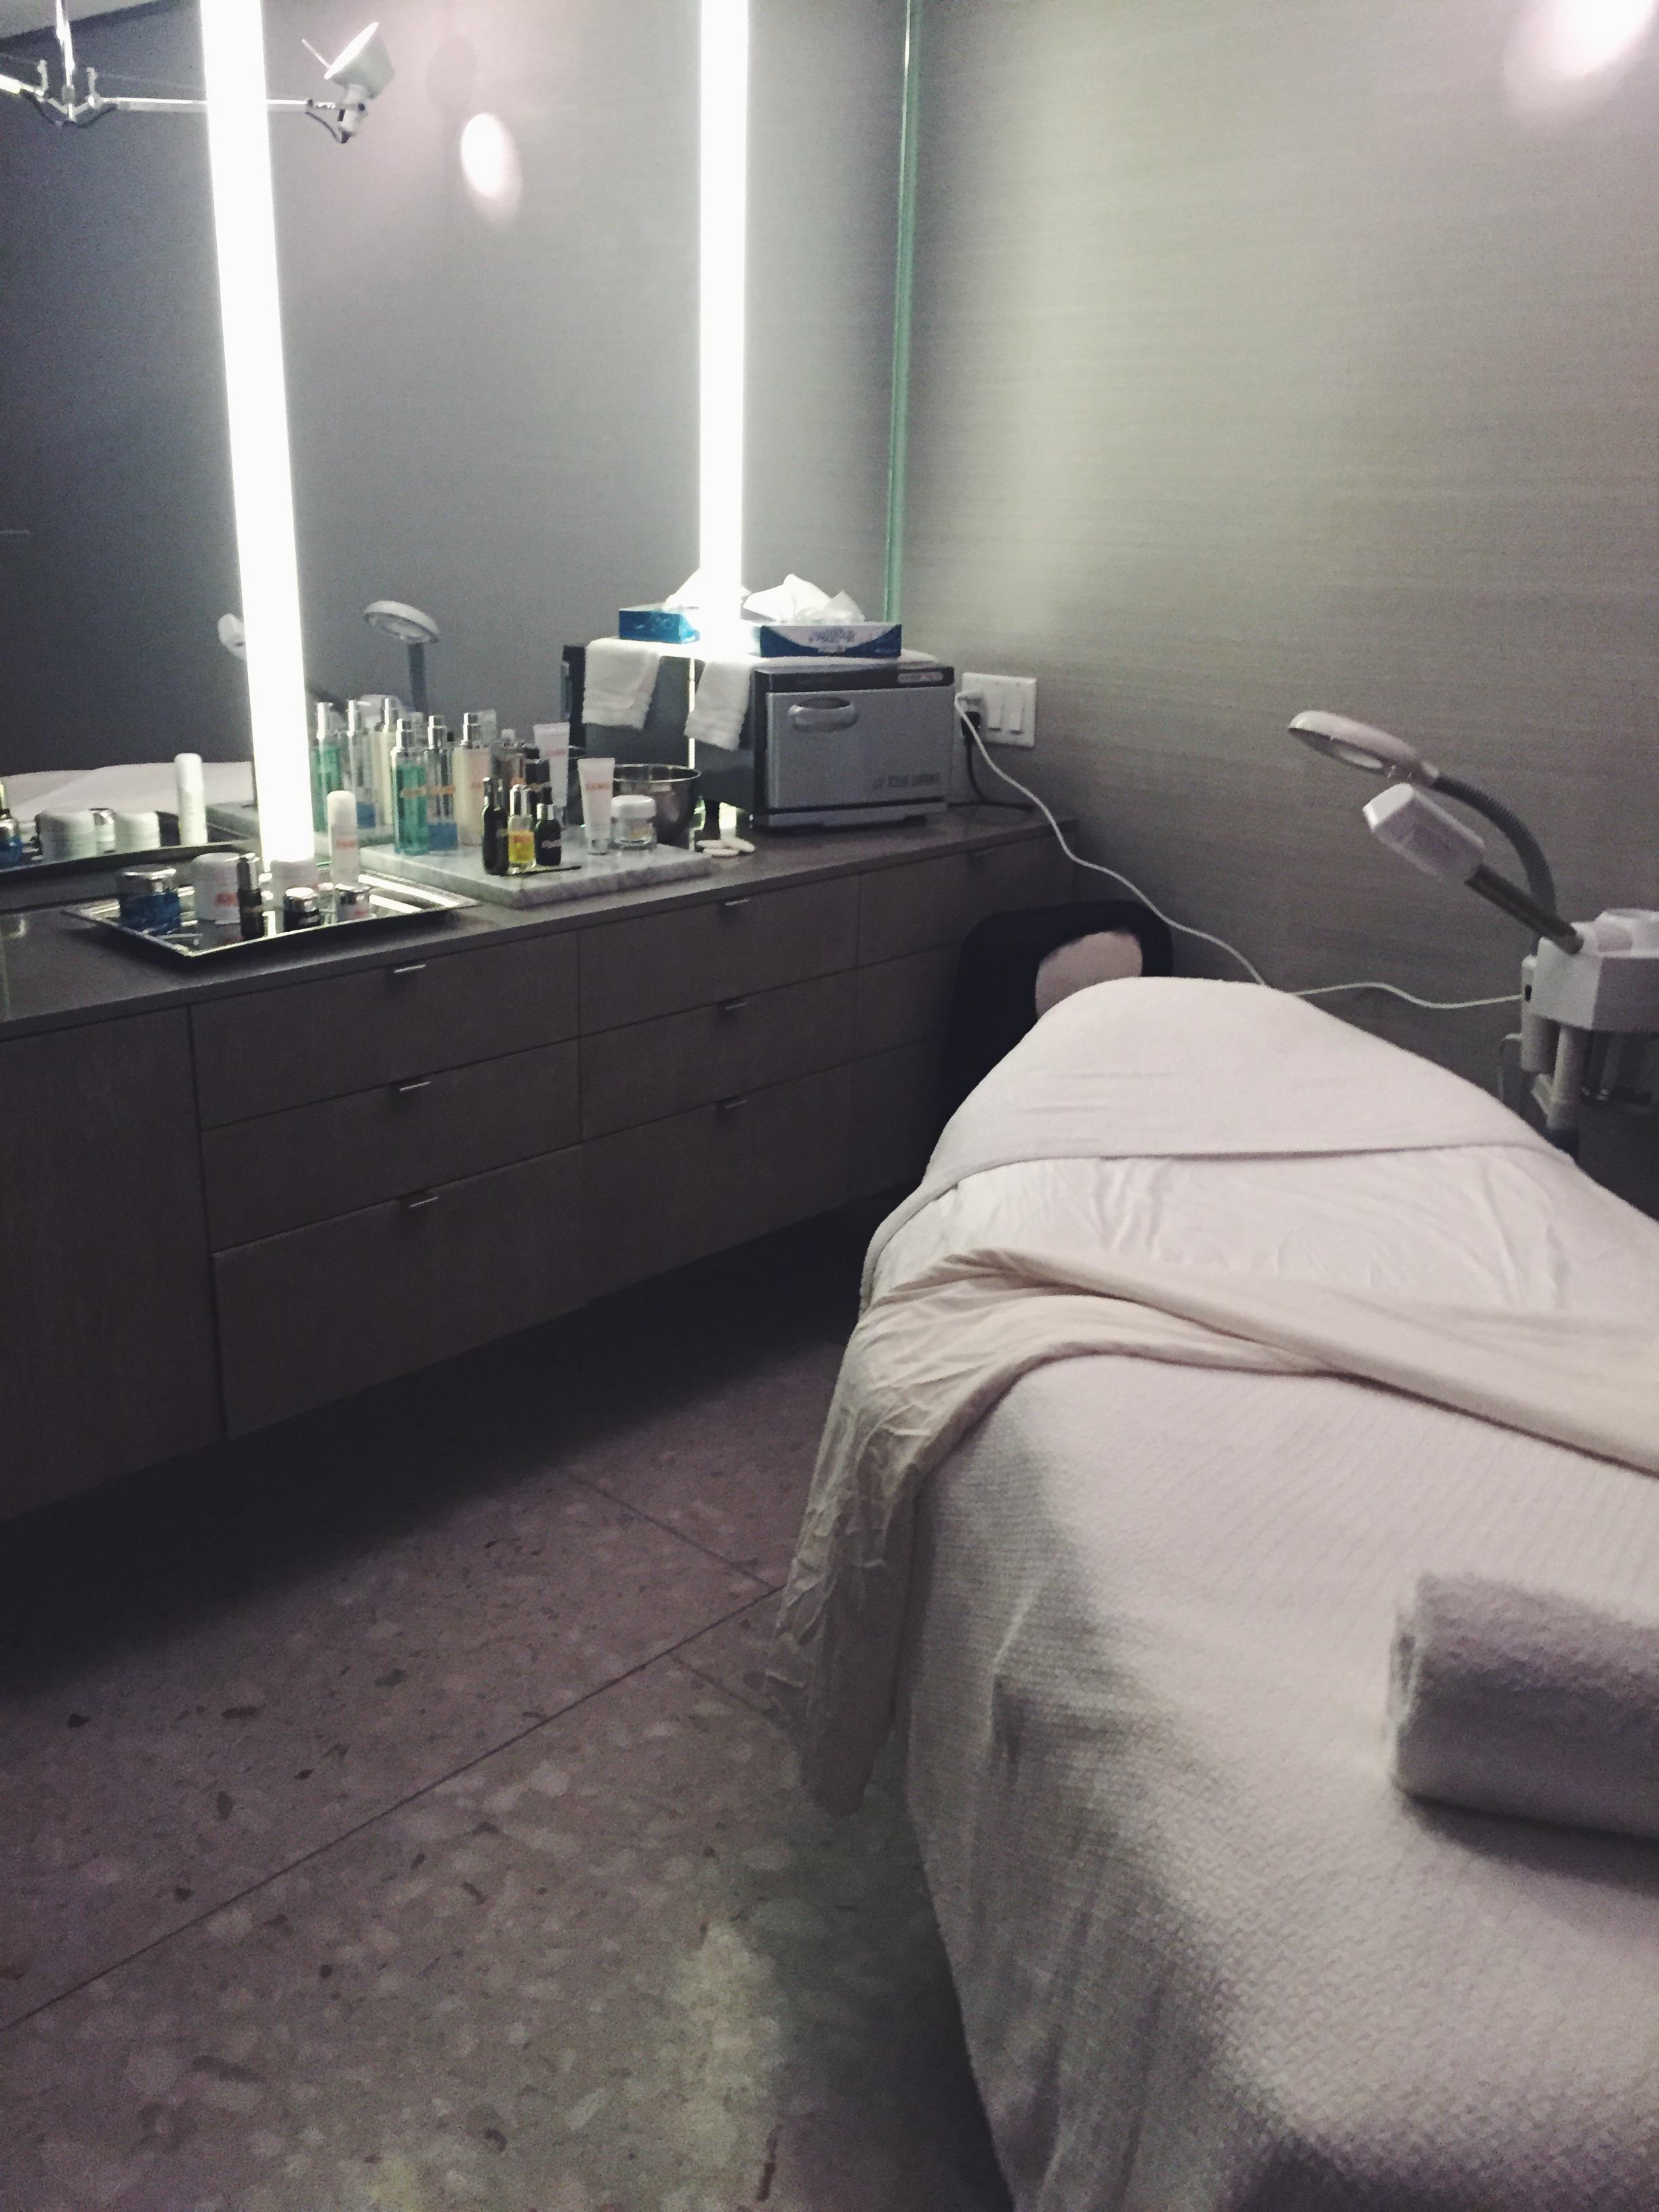 Barney's private facial room